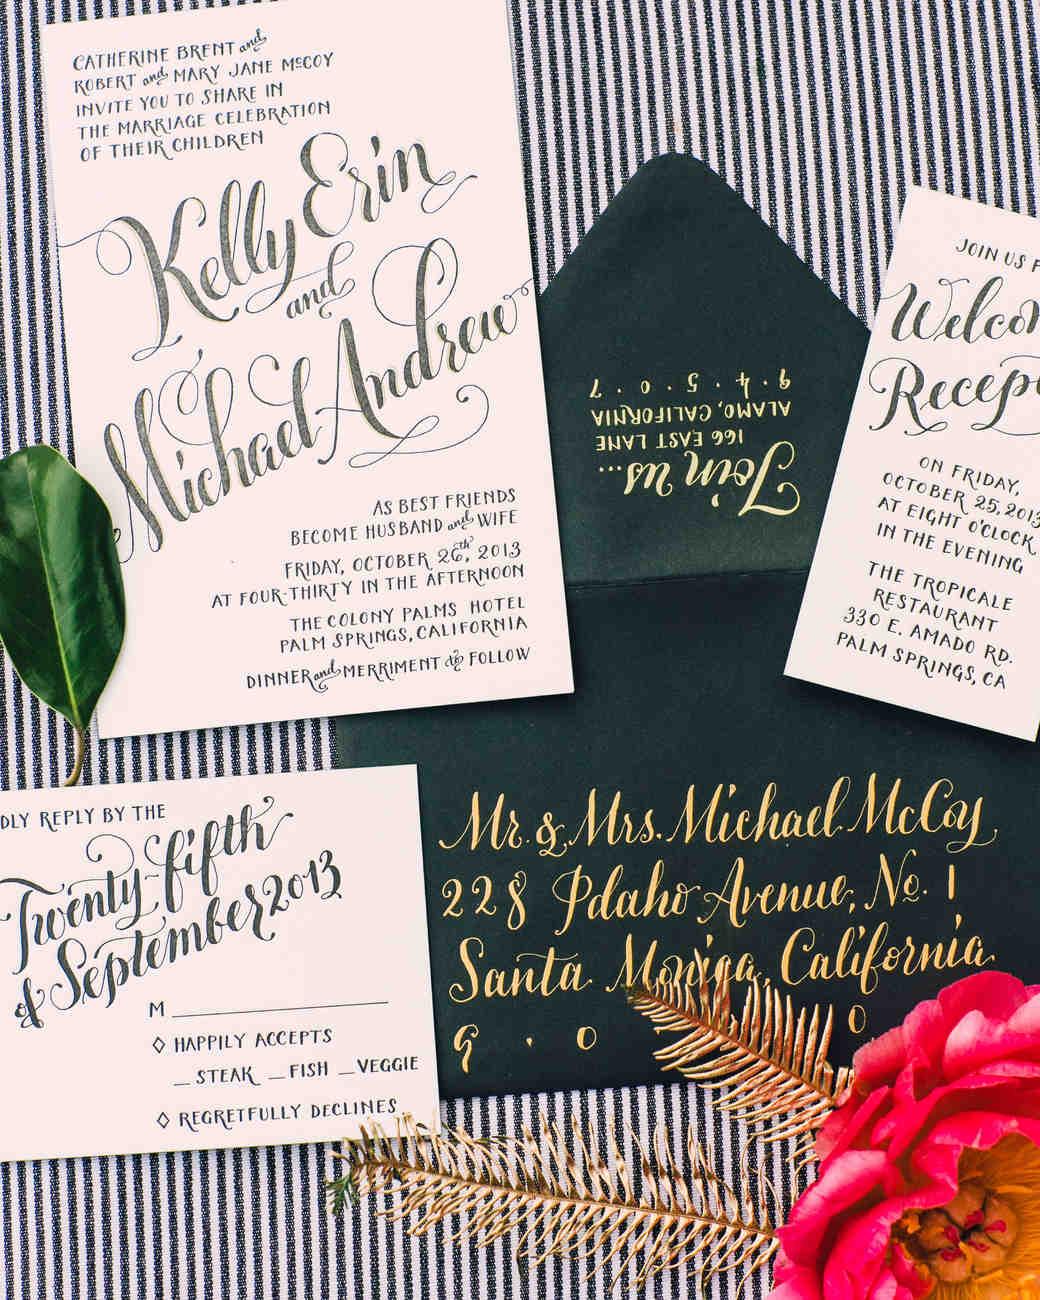 kelly_mike-wedding-invite-0514.jpg